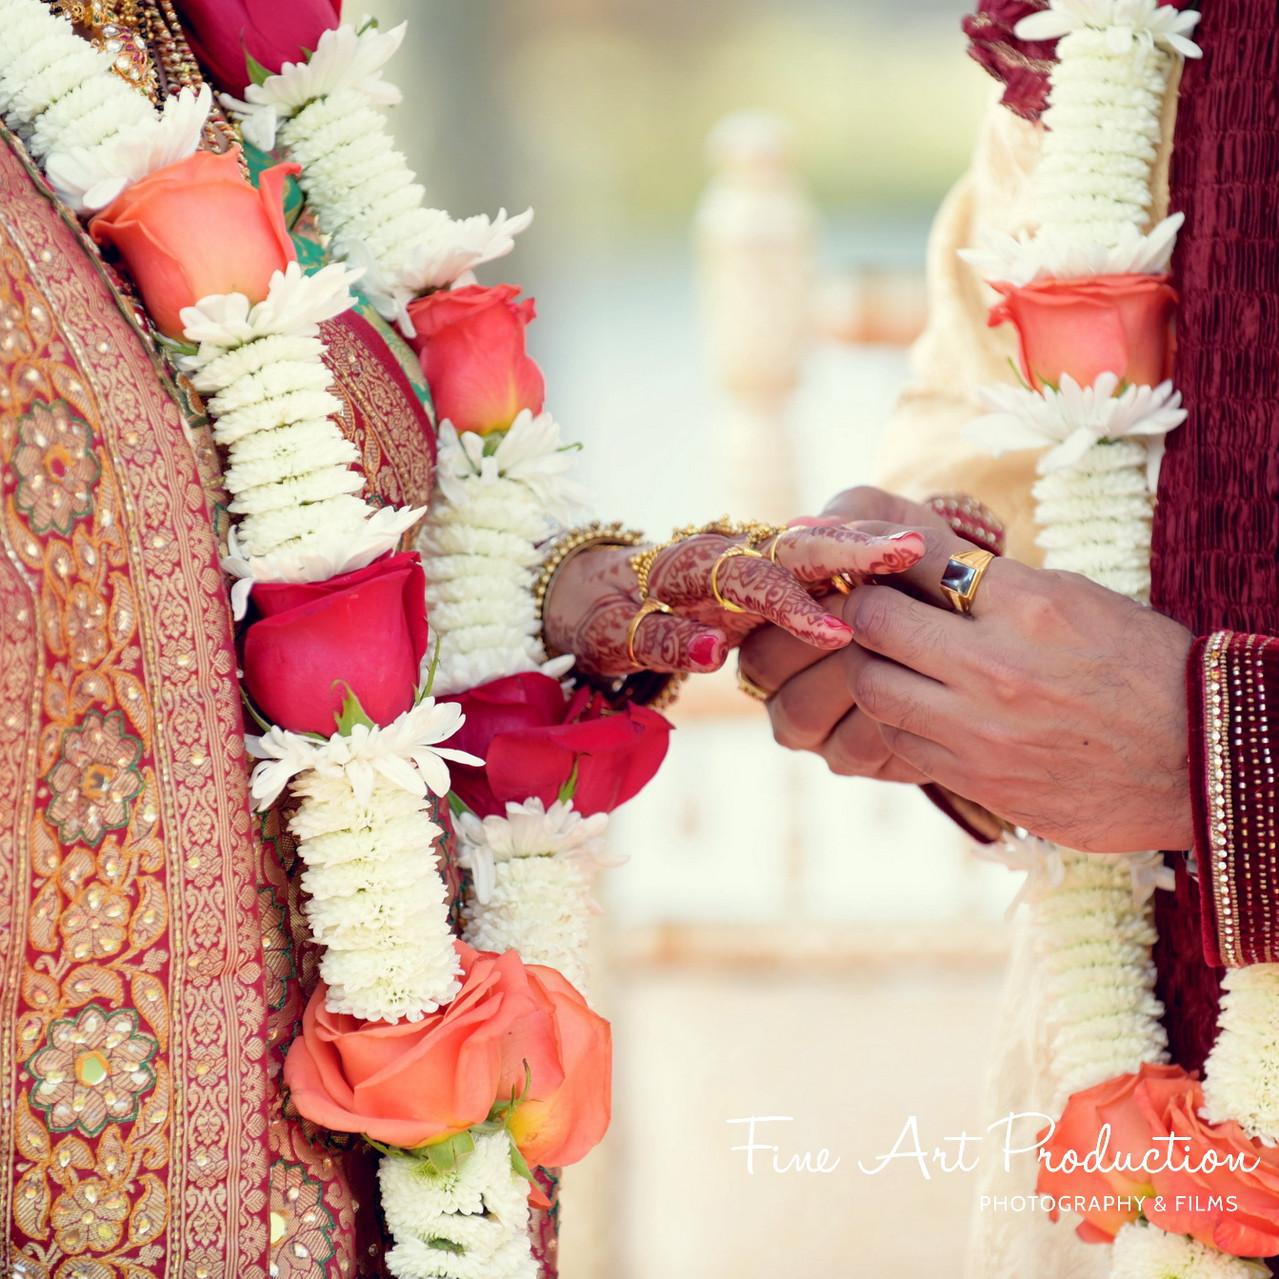 Hyatt-Regency-Grand-Cypress-Indian-Wedding-Photography-Fine-Art-Production-Amish-Thakkar_69